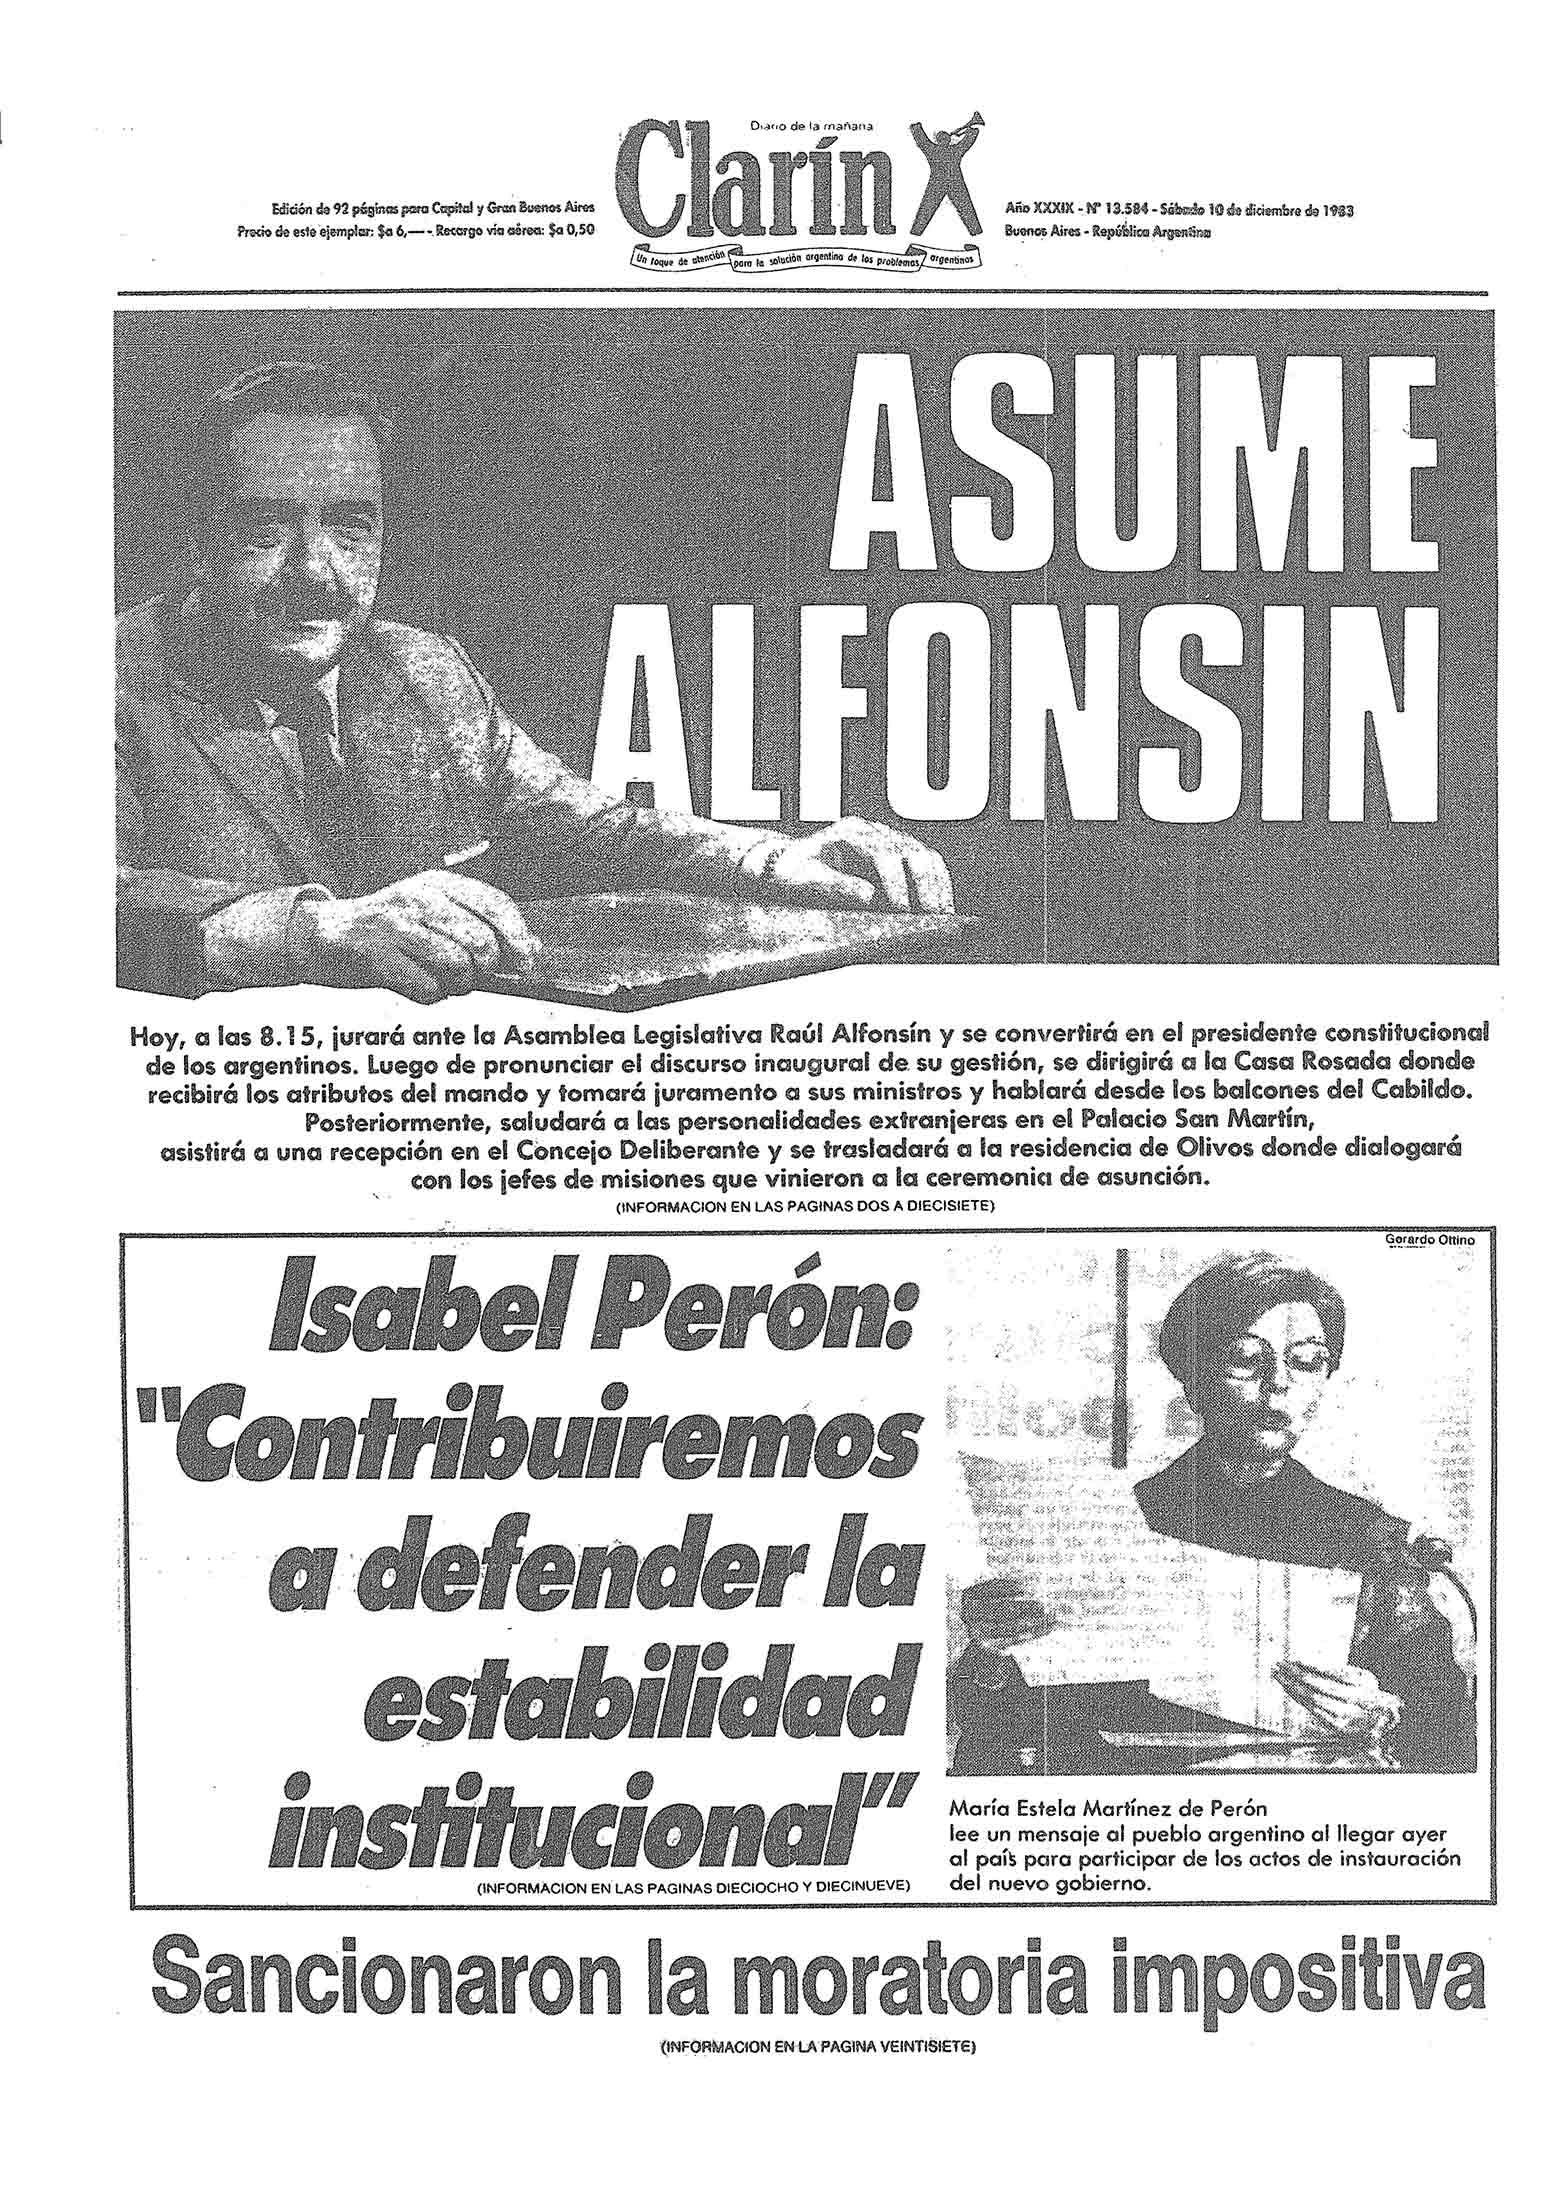 Alfonsin 1983